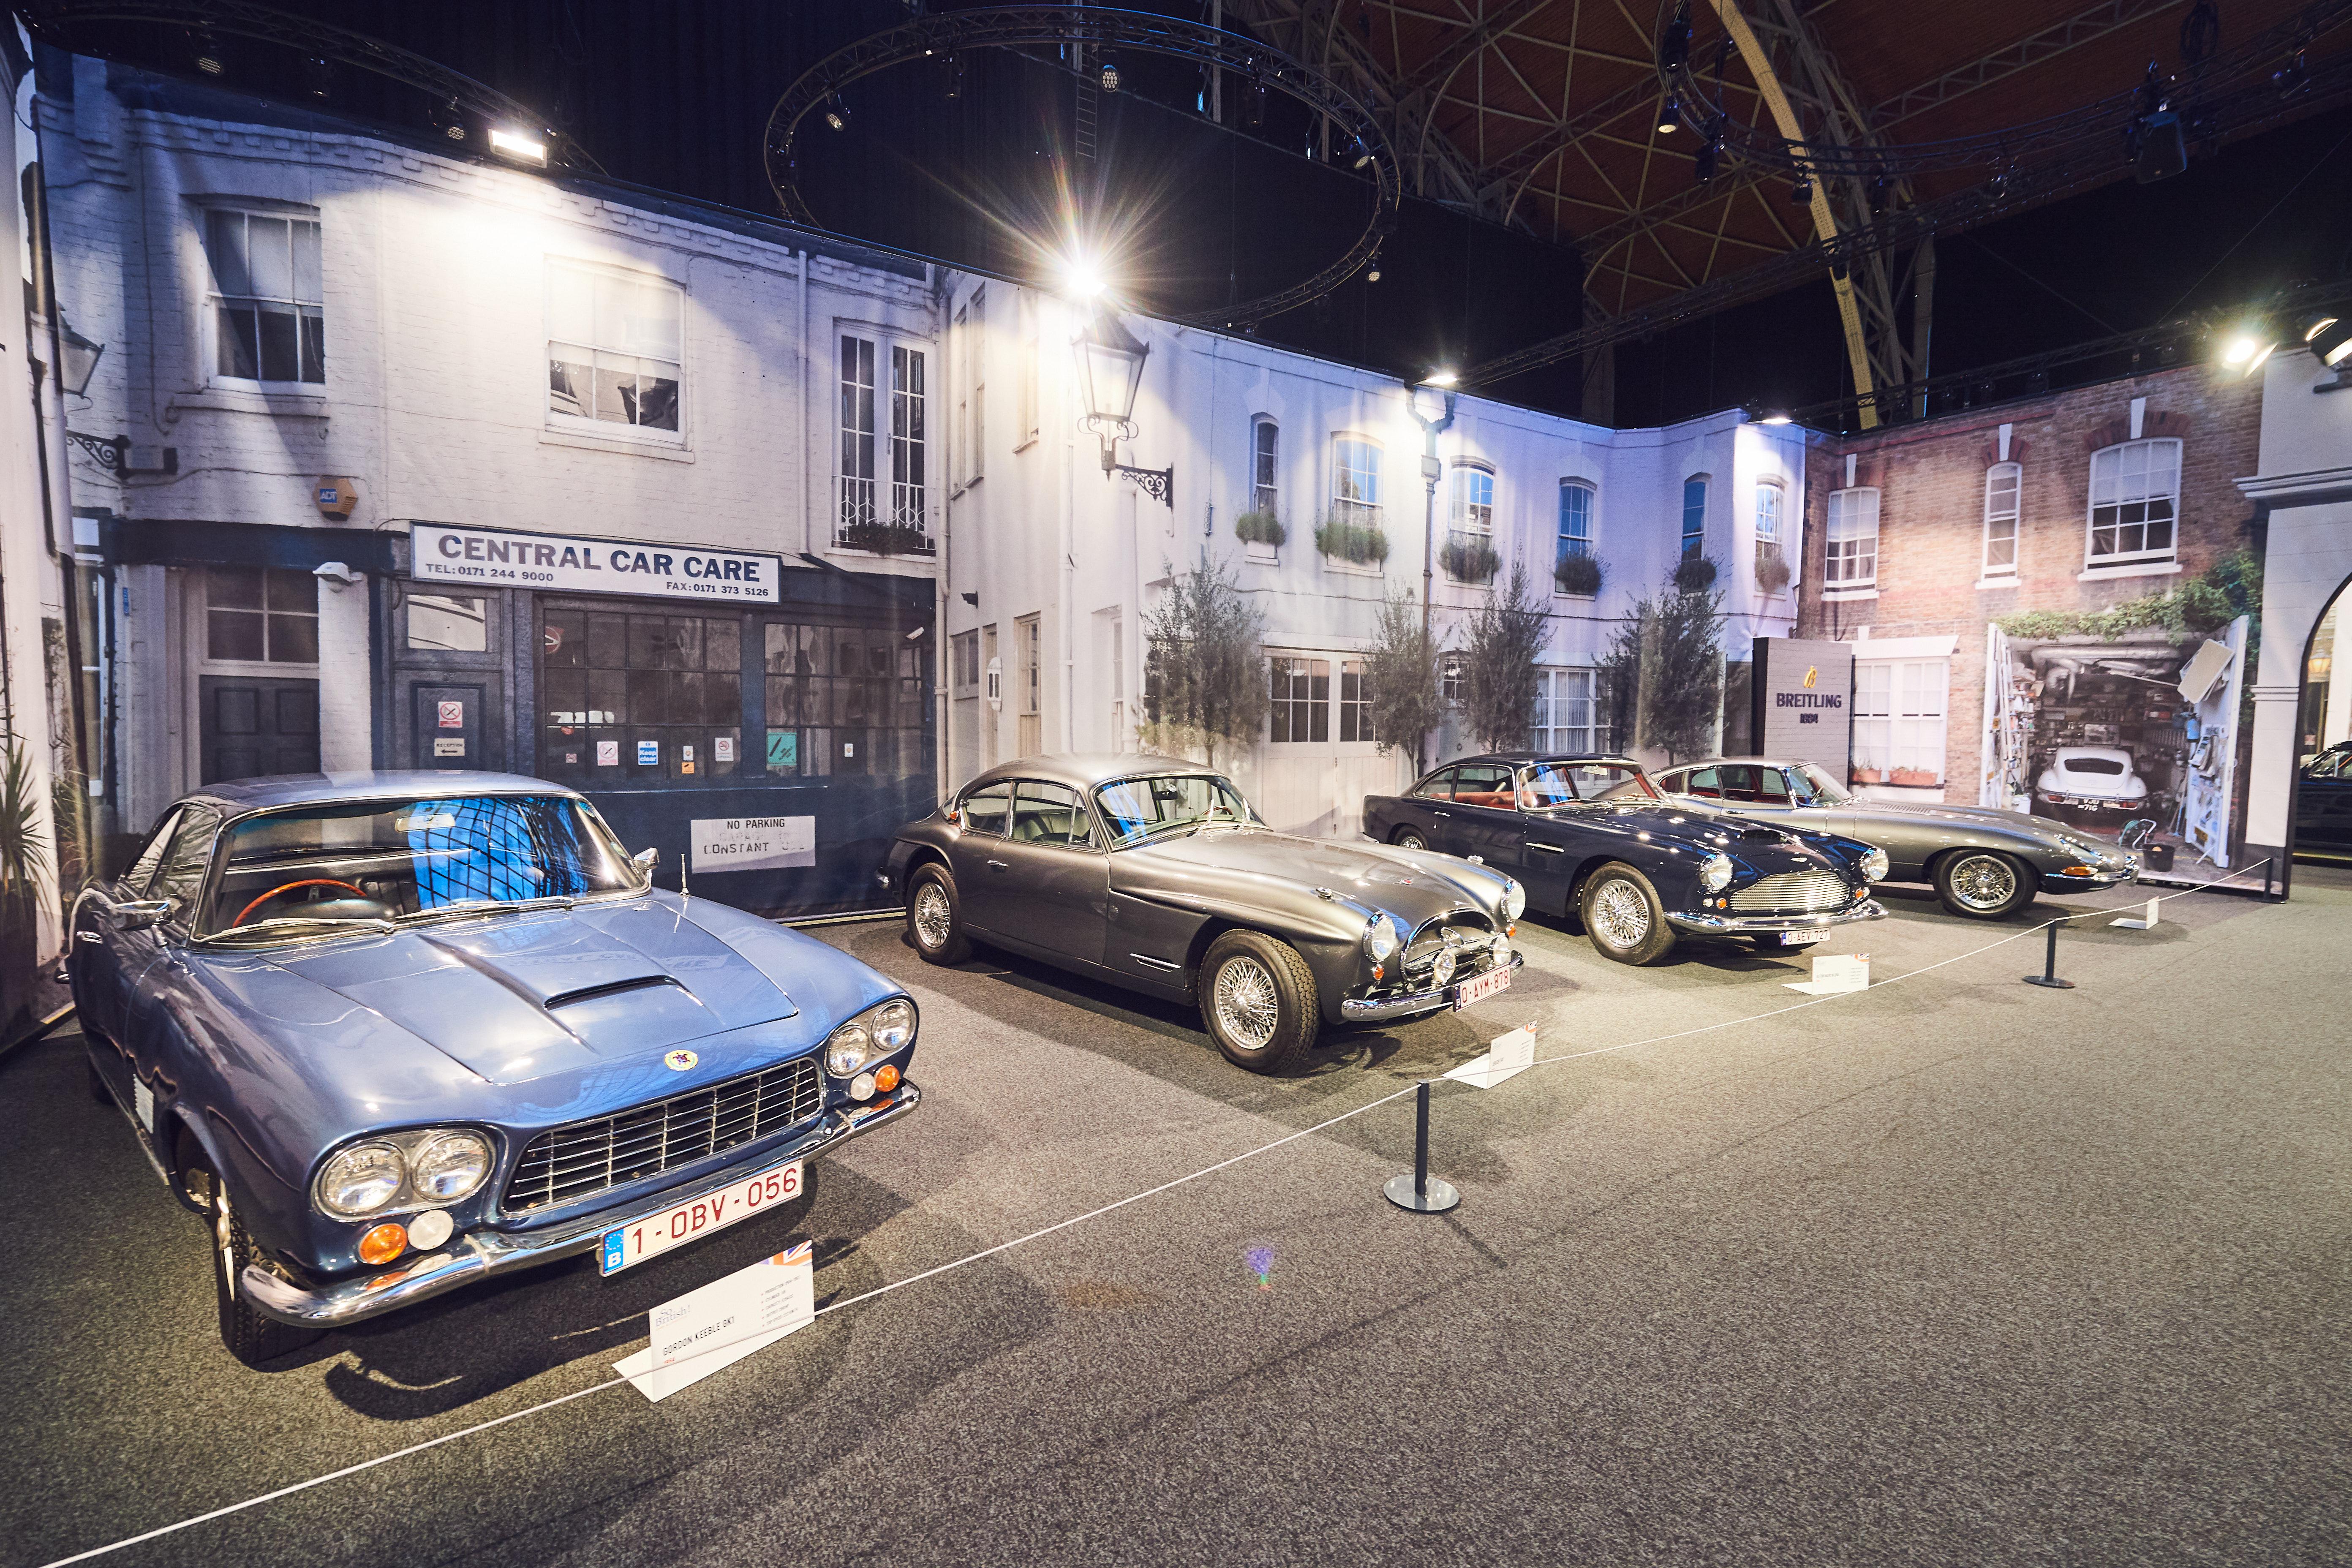 191212-Autoworld-So-British! exposition 10